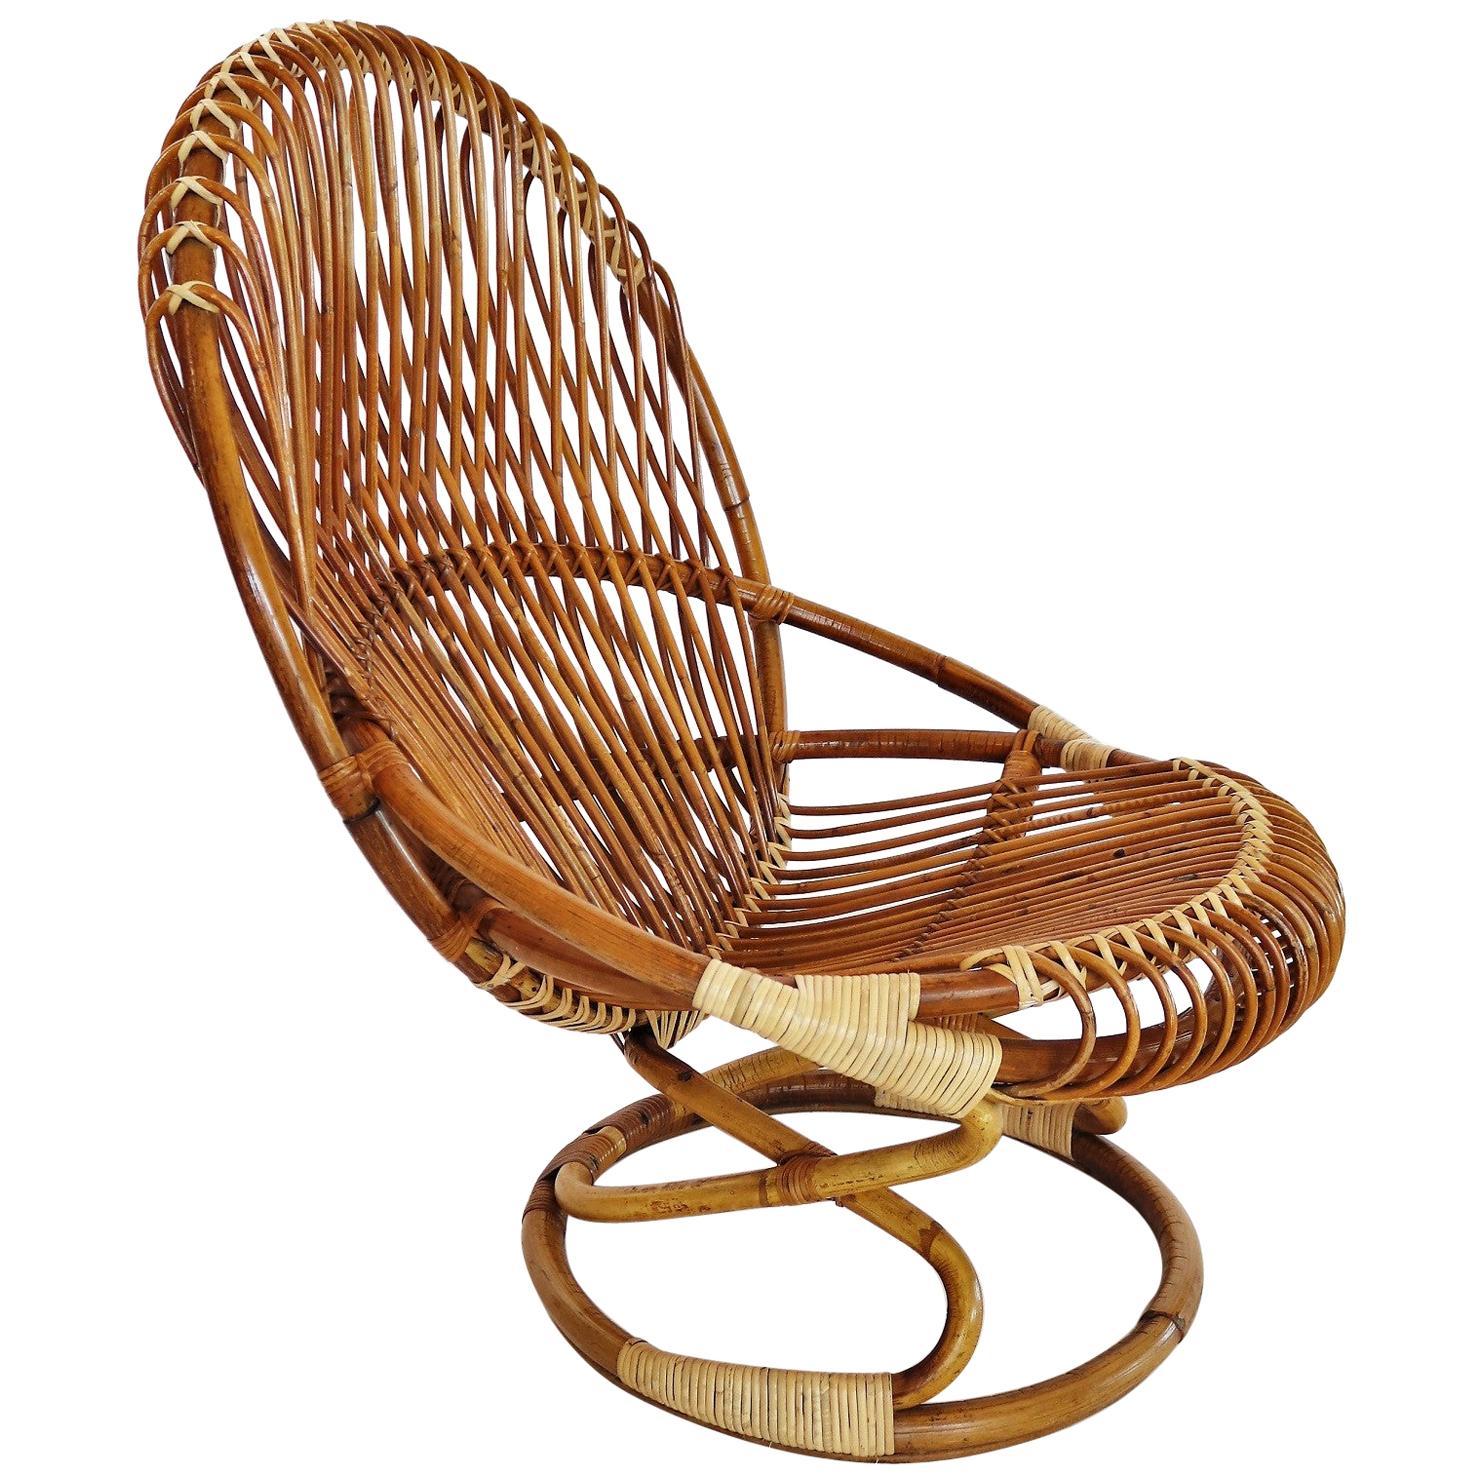 Italian Midcentury Bamboo Rattan Chair by Tito Agnoli for Bonacina, 1950s